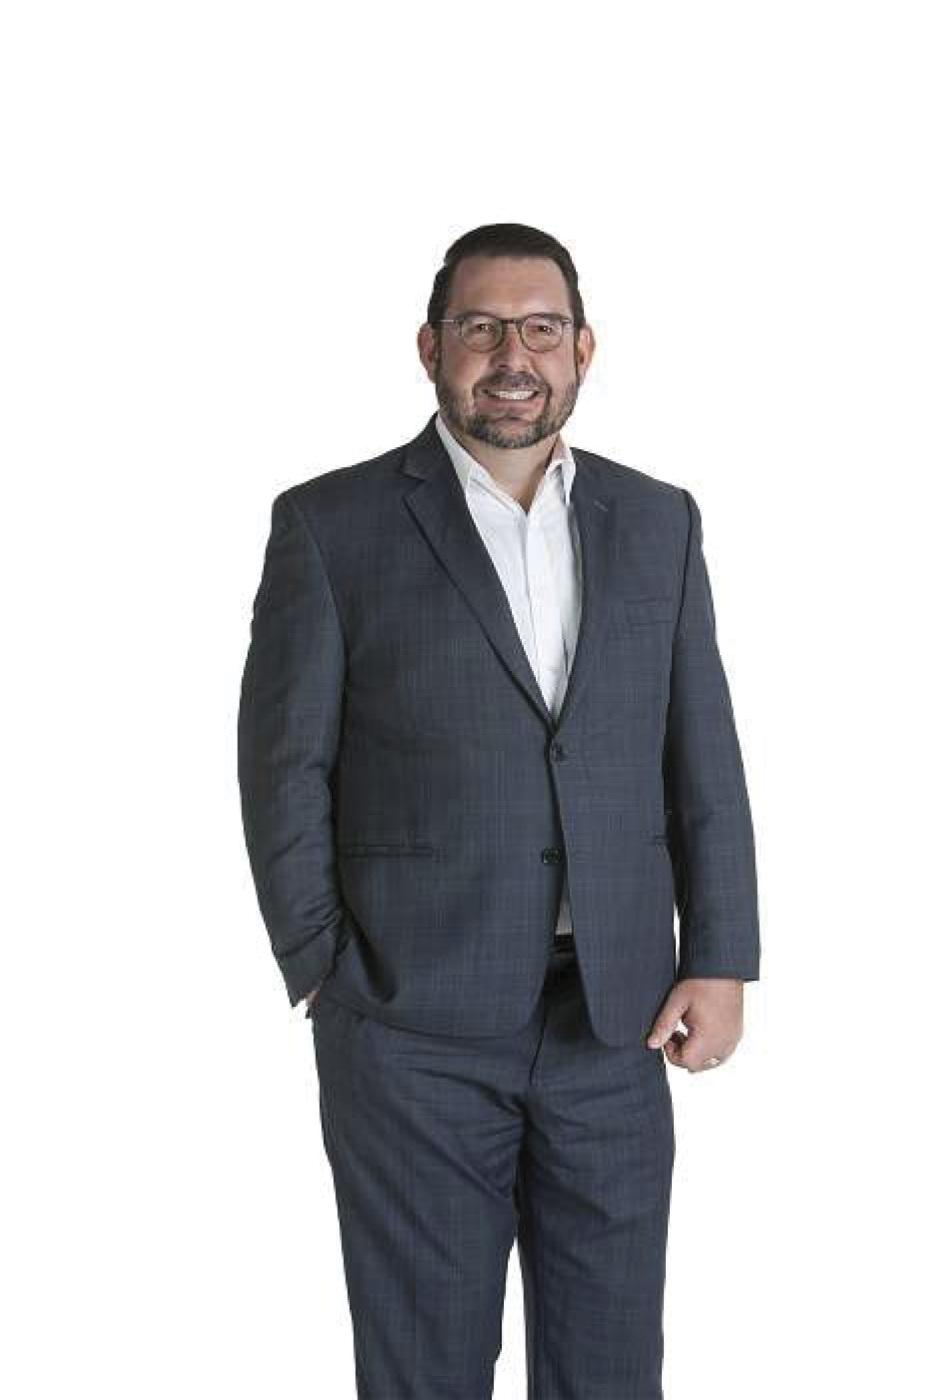 Realtor of the Week: Joel Bickley serves clients through market ups, downs